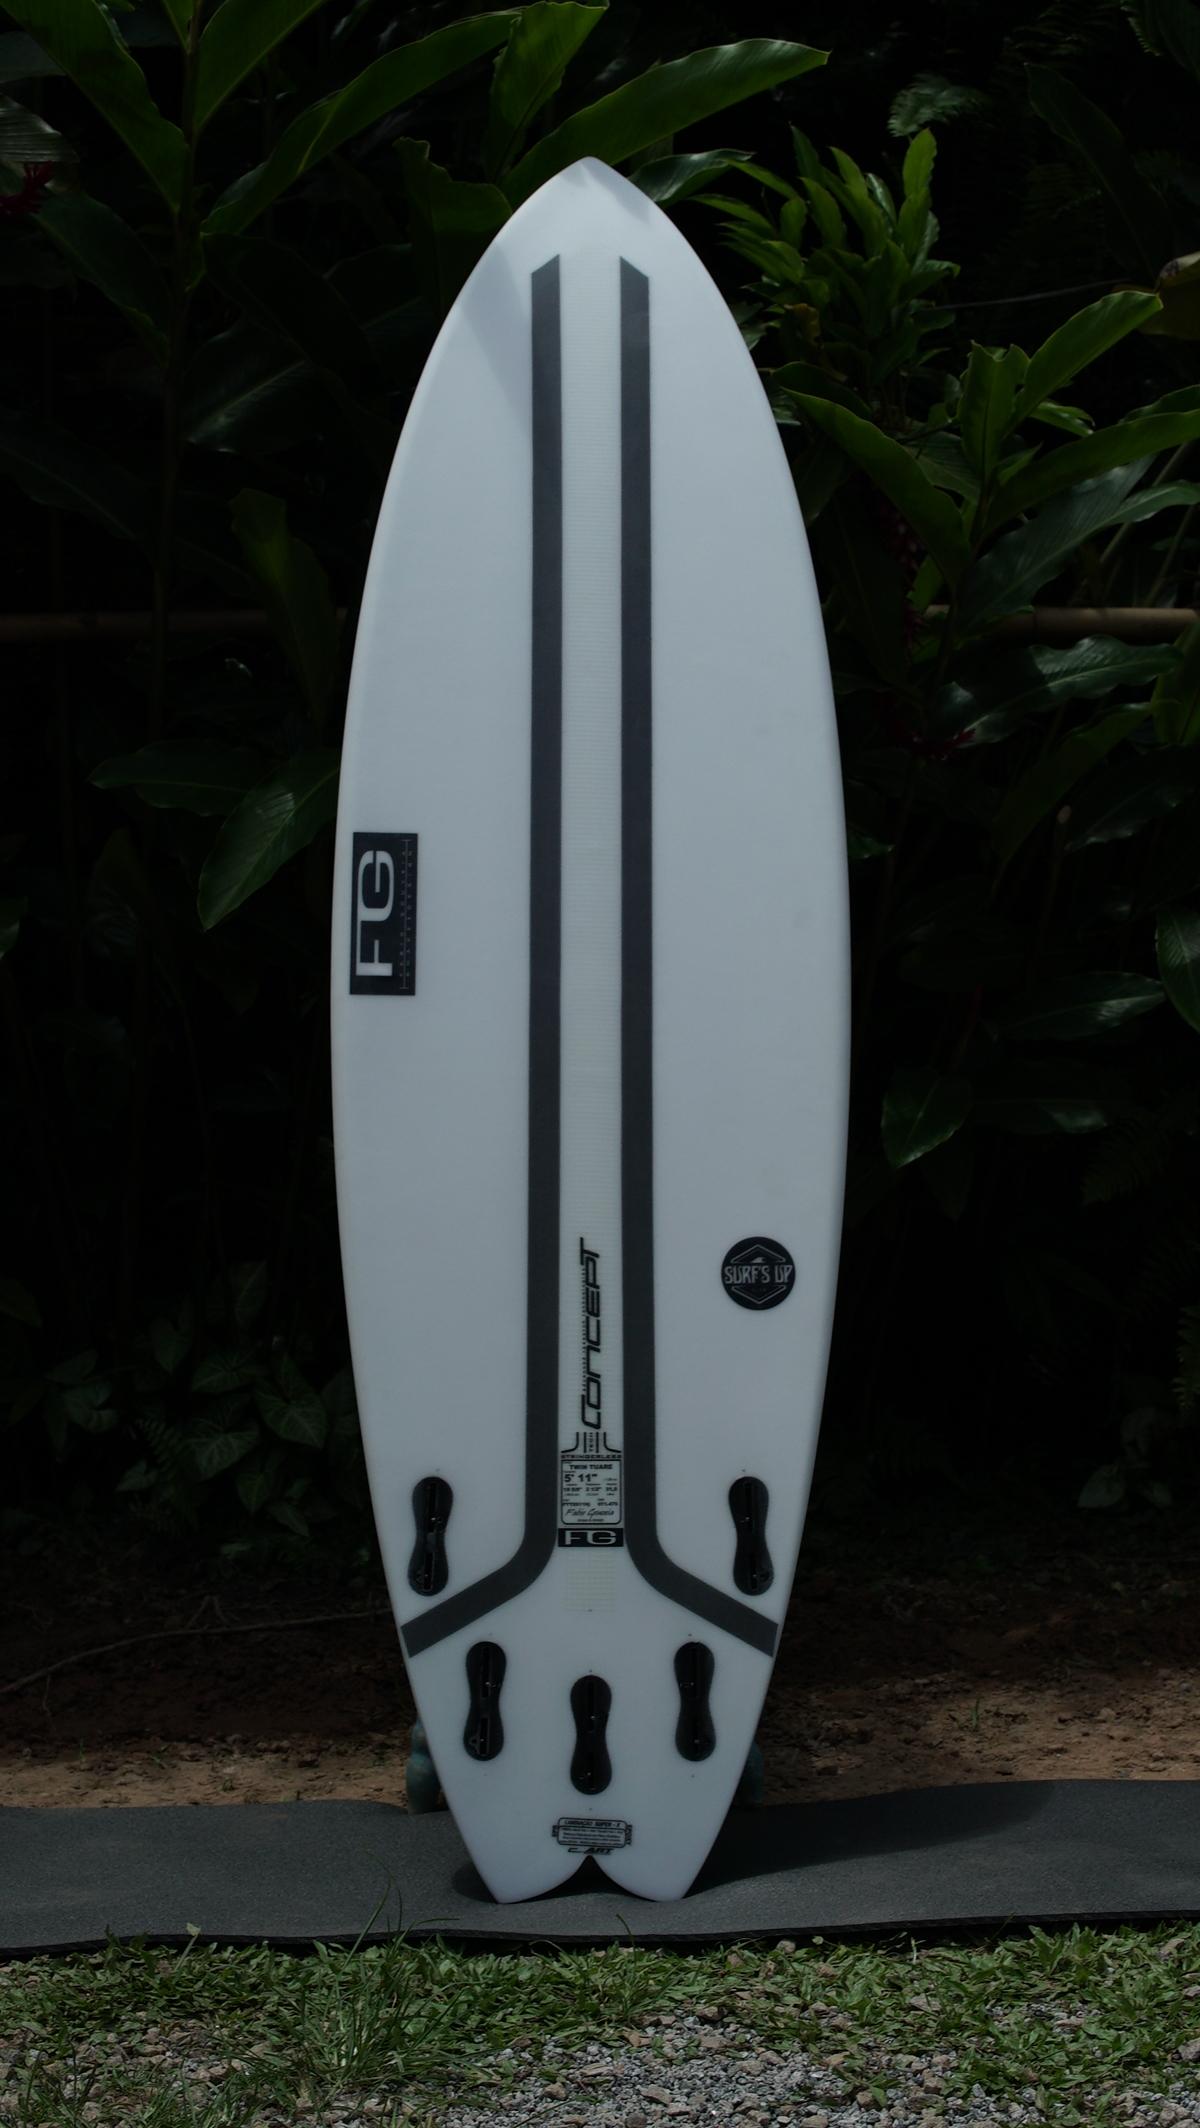 DSC01951.JPG